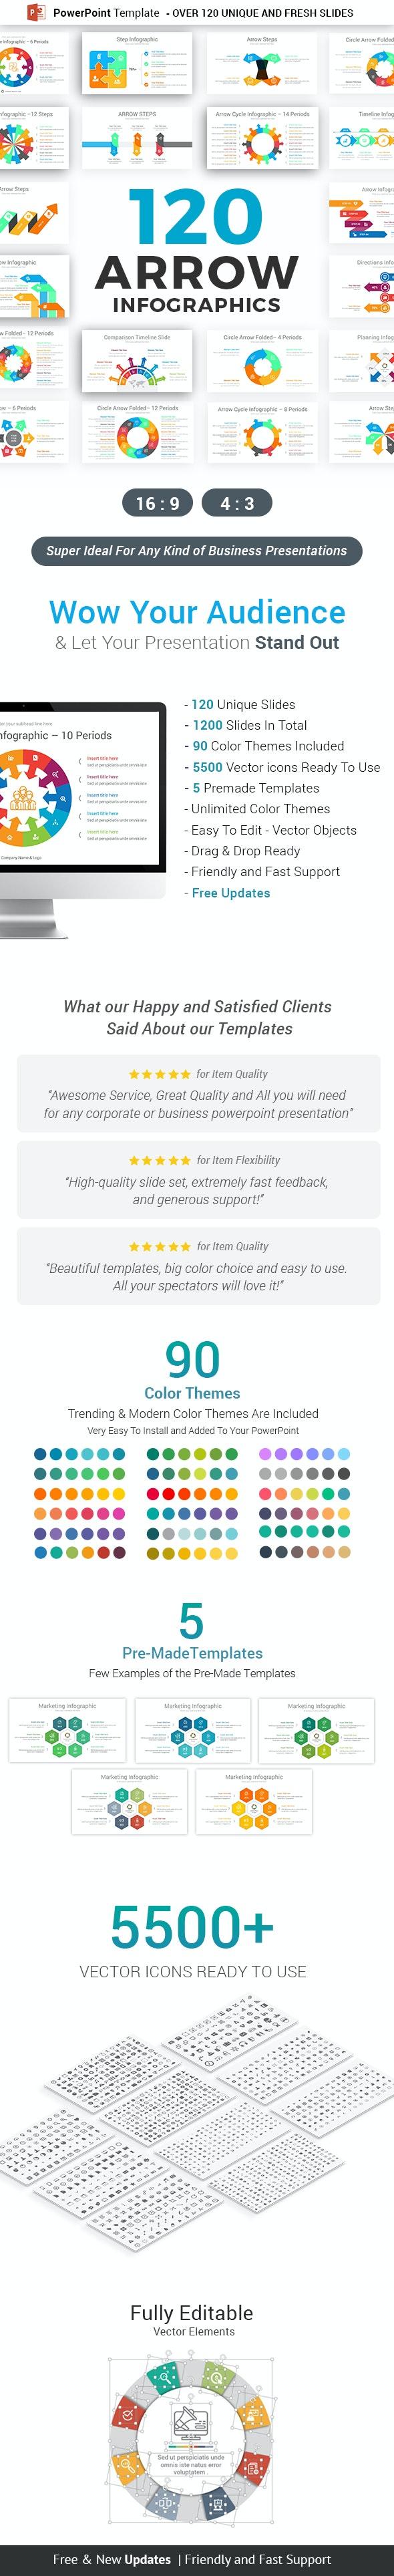 Arrow Infographics PowerPoint Template Diagrams - Business PowerPoint Templates